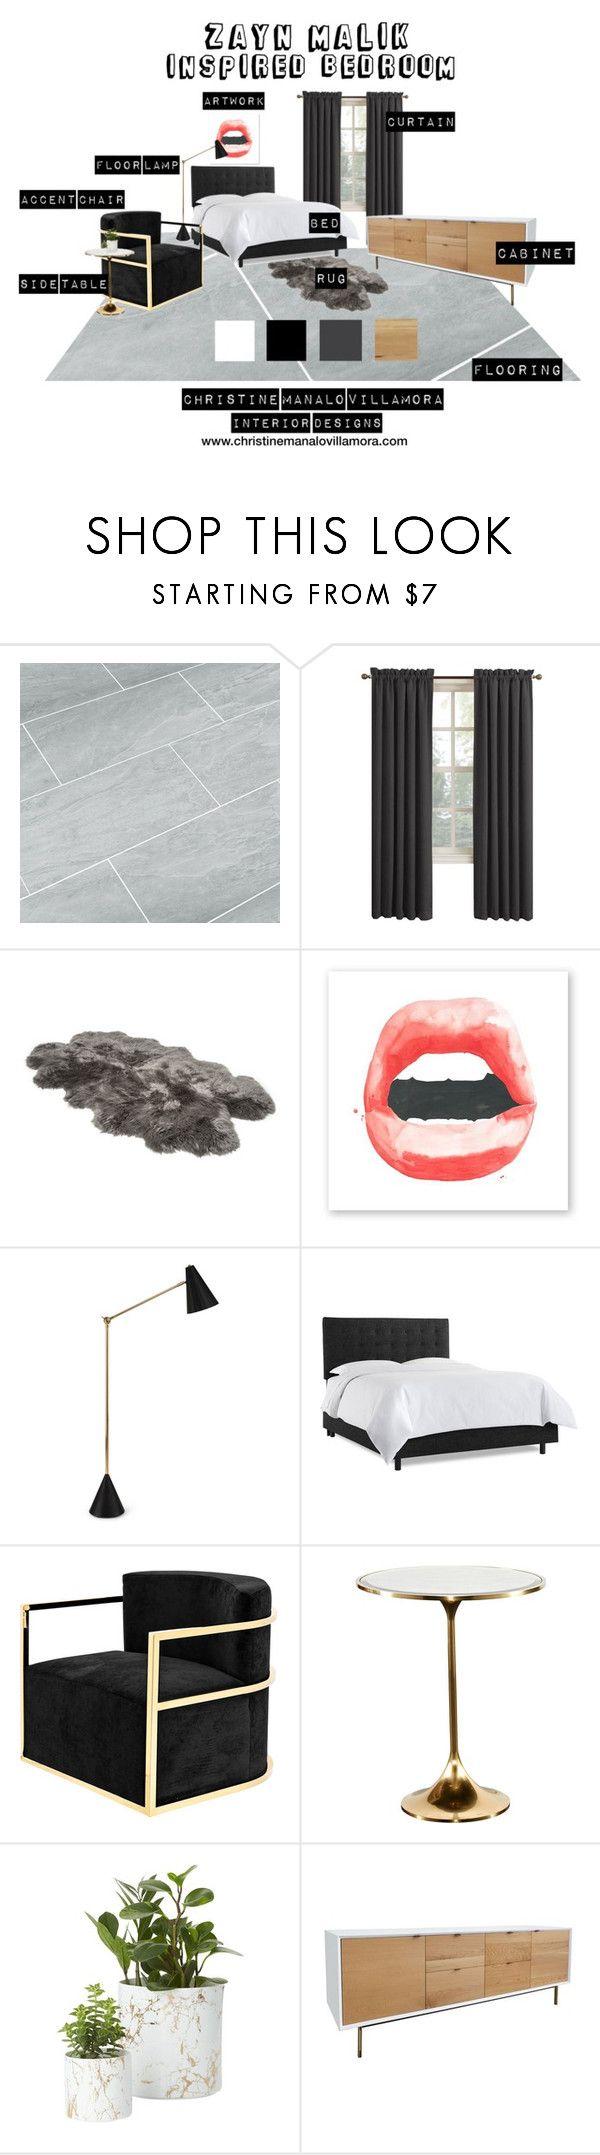 """Zayn Malik inspired bedroom"" by kath-cmvinteriordesigns on Polyvore featuring interior, interiors, interior design, home, home decor, interior decorating, Sun Zero, UGG, Jonathan Adler and Eichholtz"